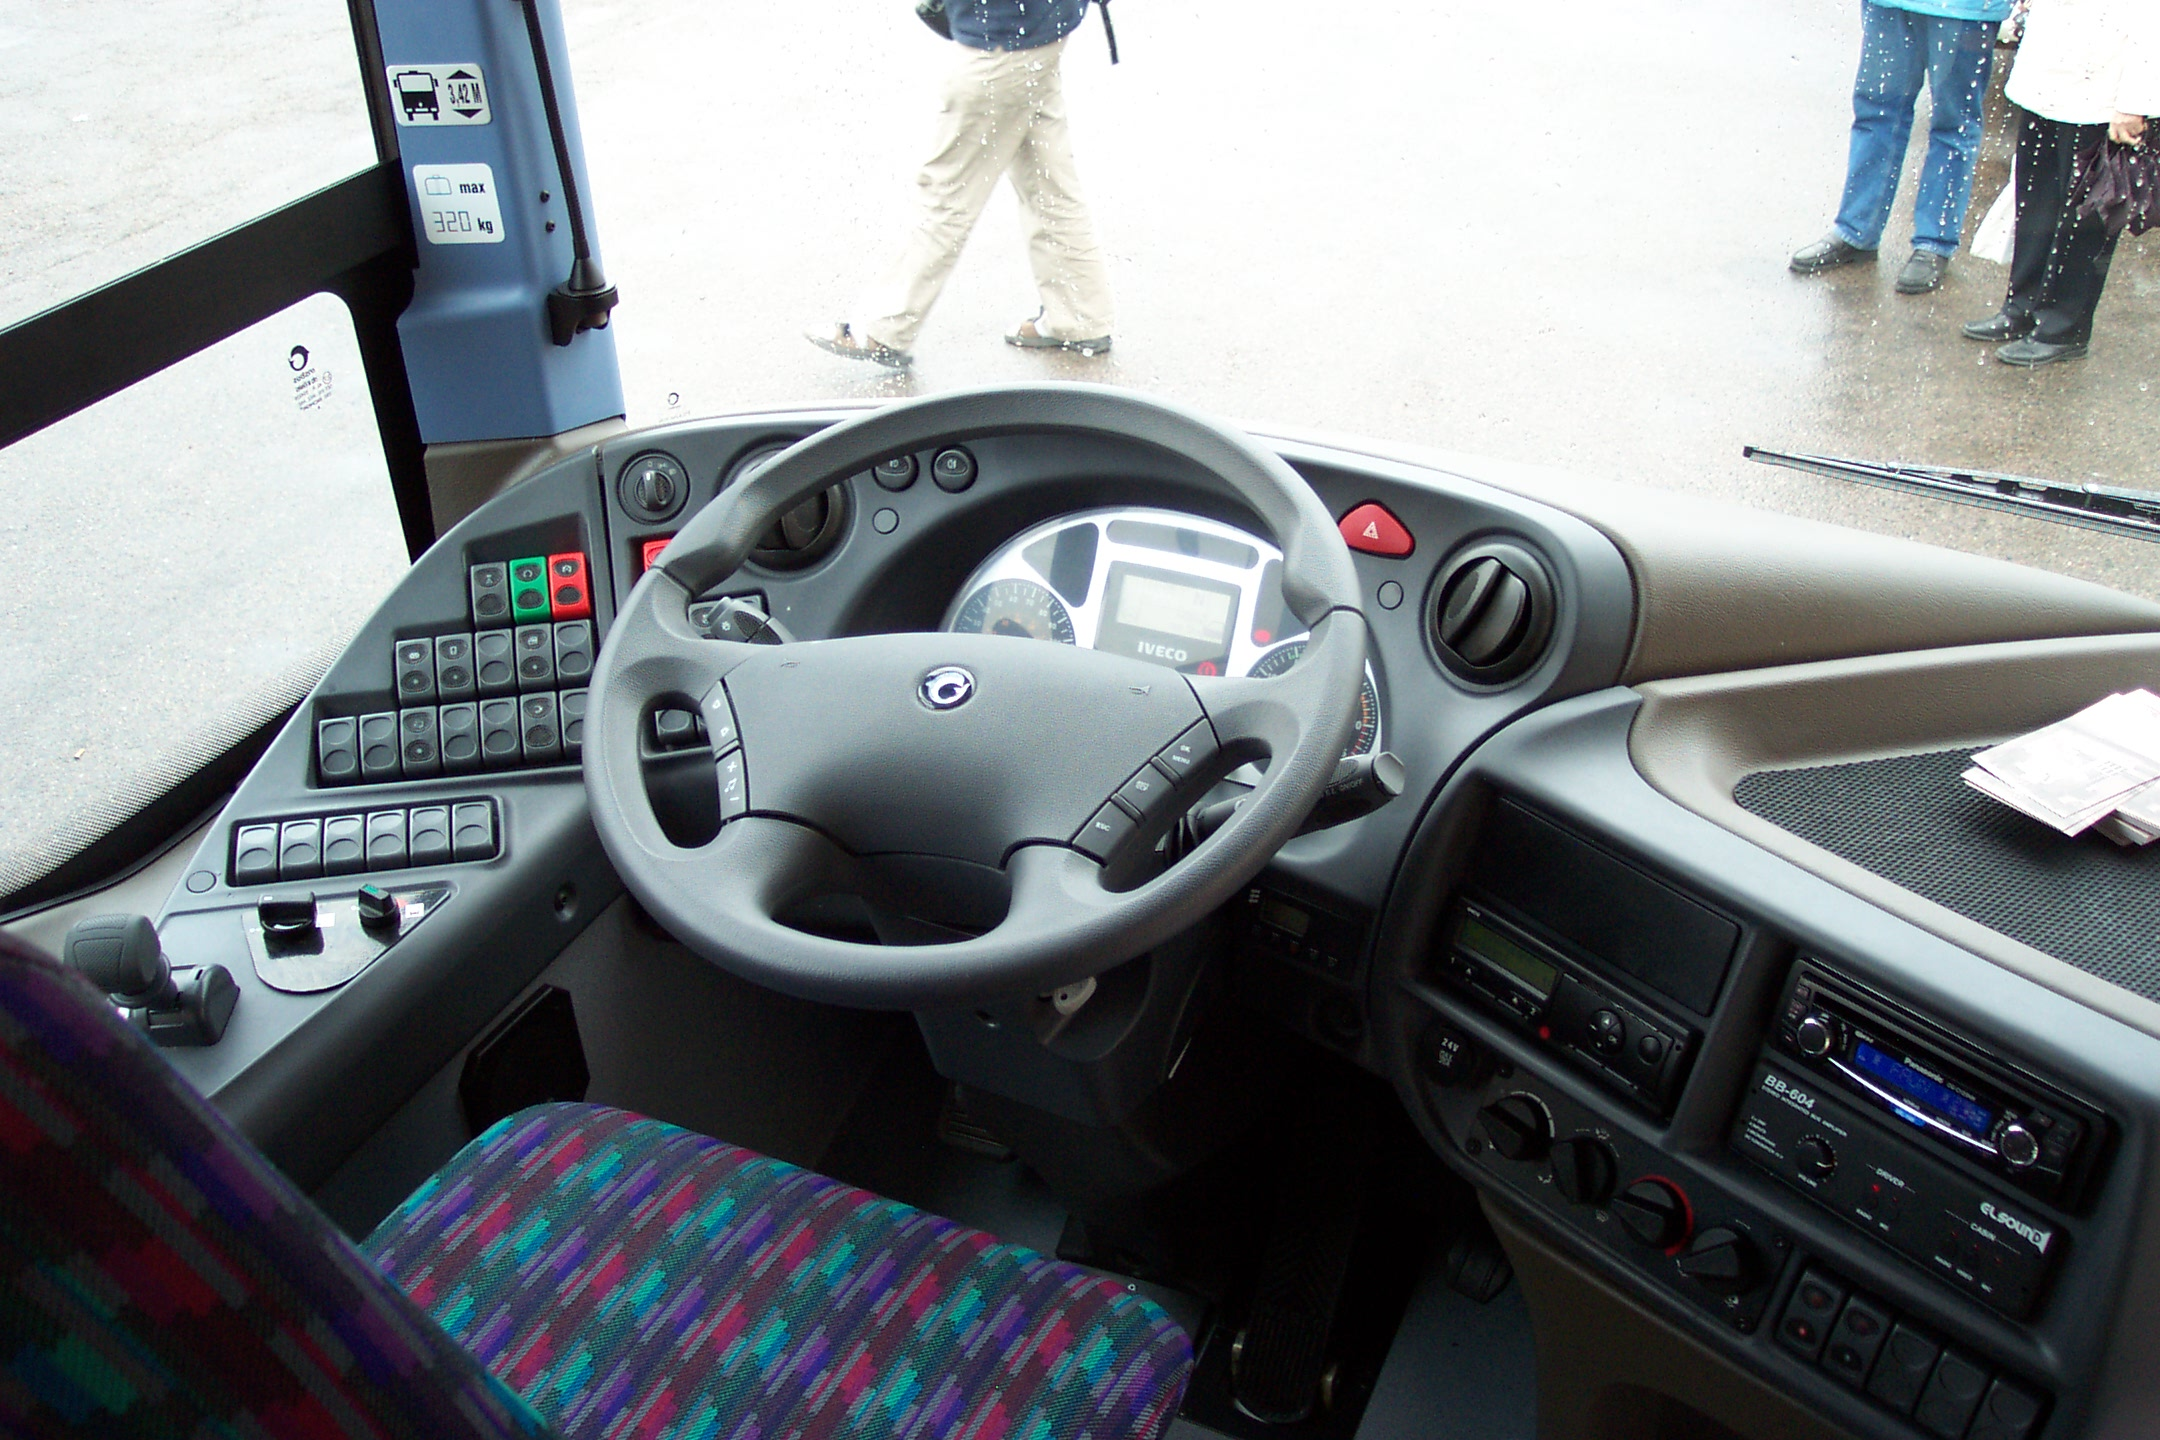 File Pardubice Vozovna Dukla Irisbus Crossway Panel